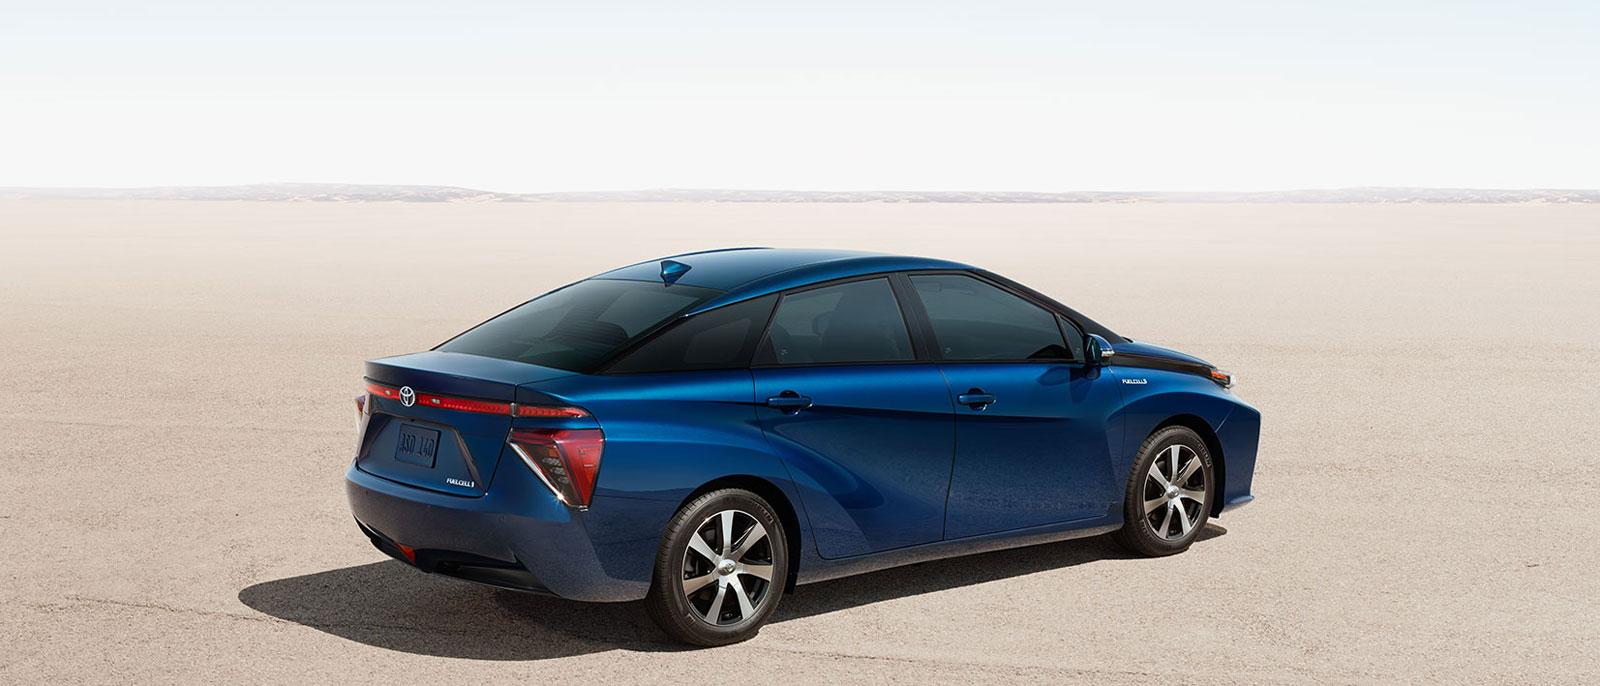 2016 Toyota Mirai profile view